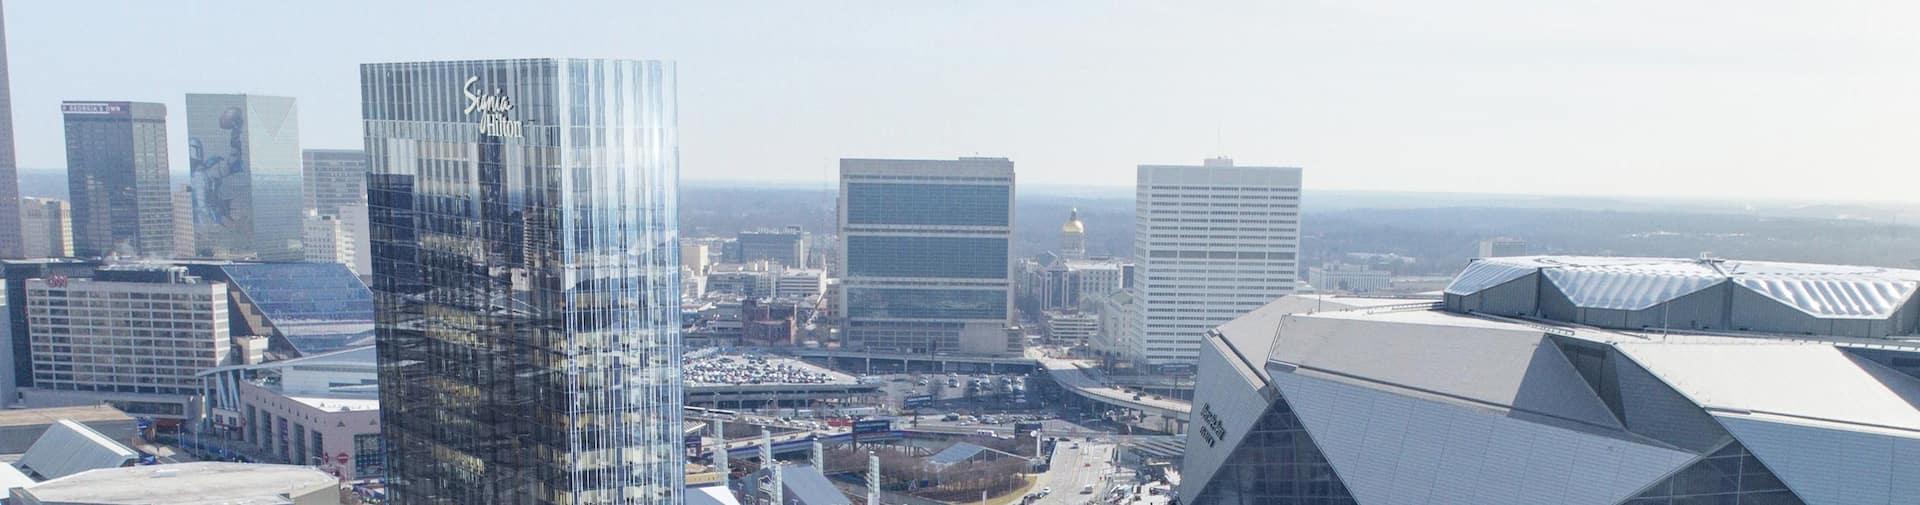 Aerial view of Signia Hilton Atlanta exterior